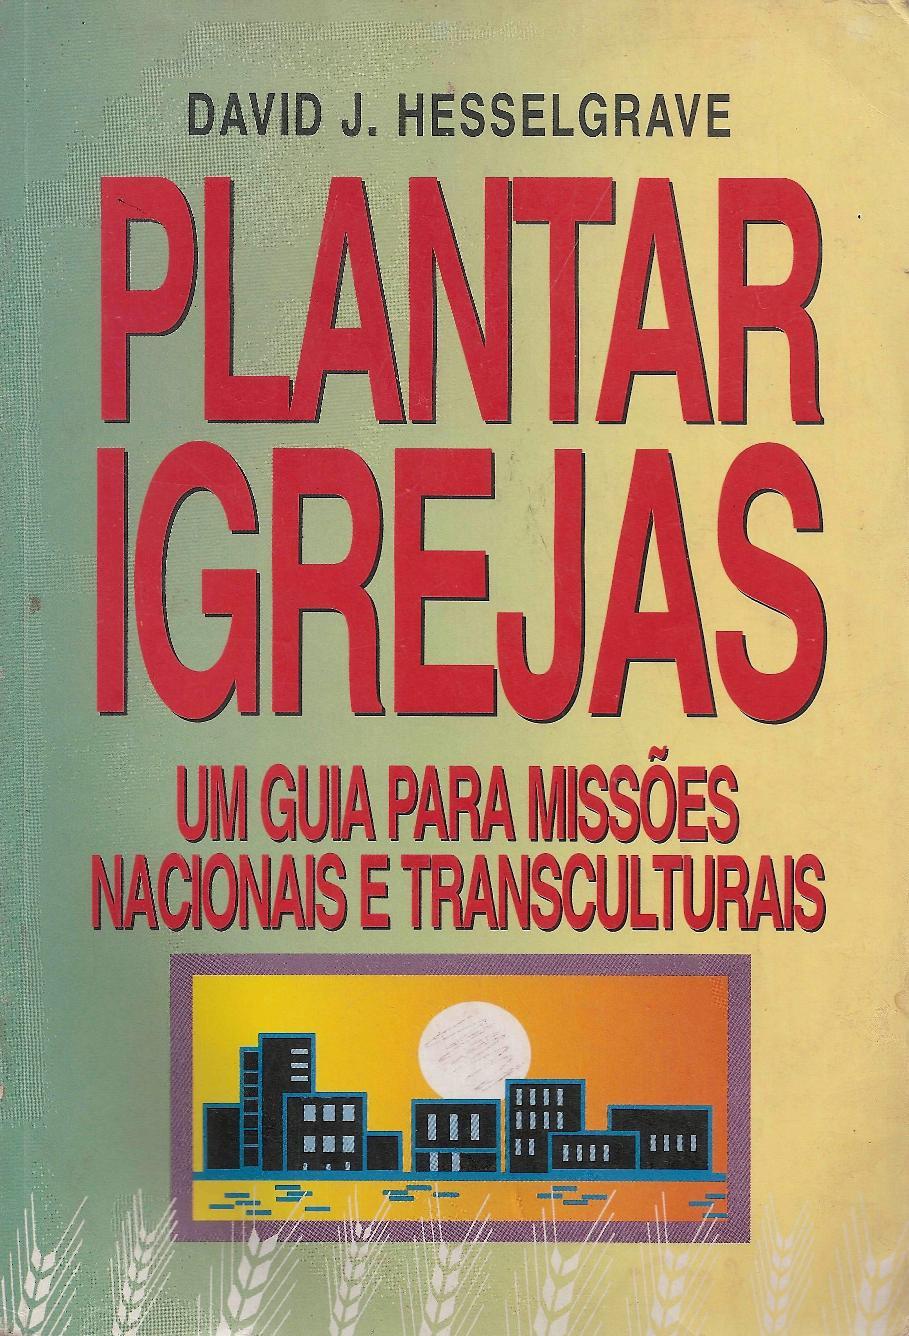 Plantar Igrejas - David Hesselgrave